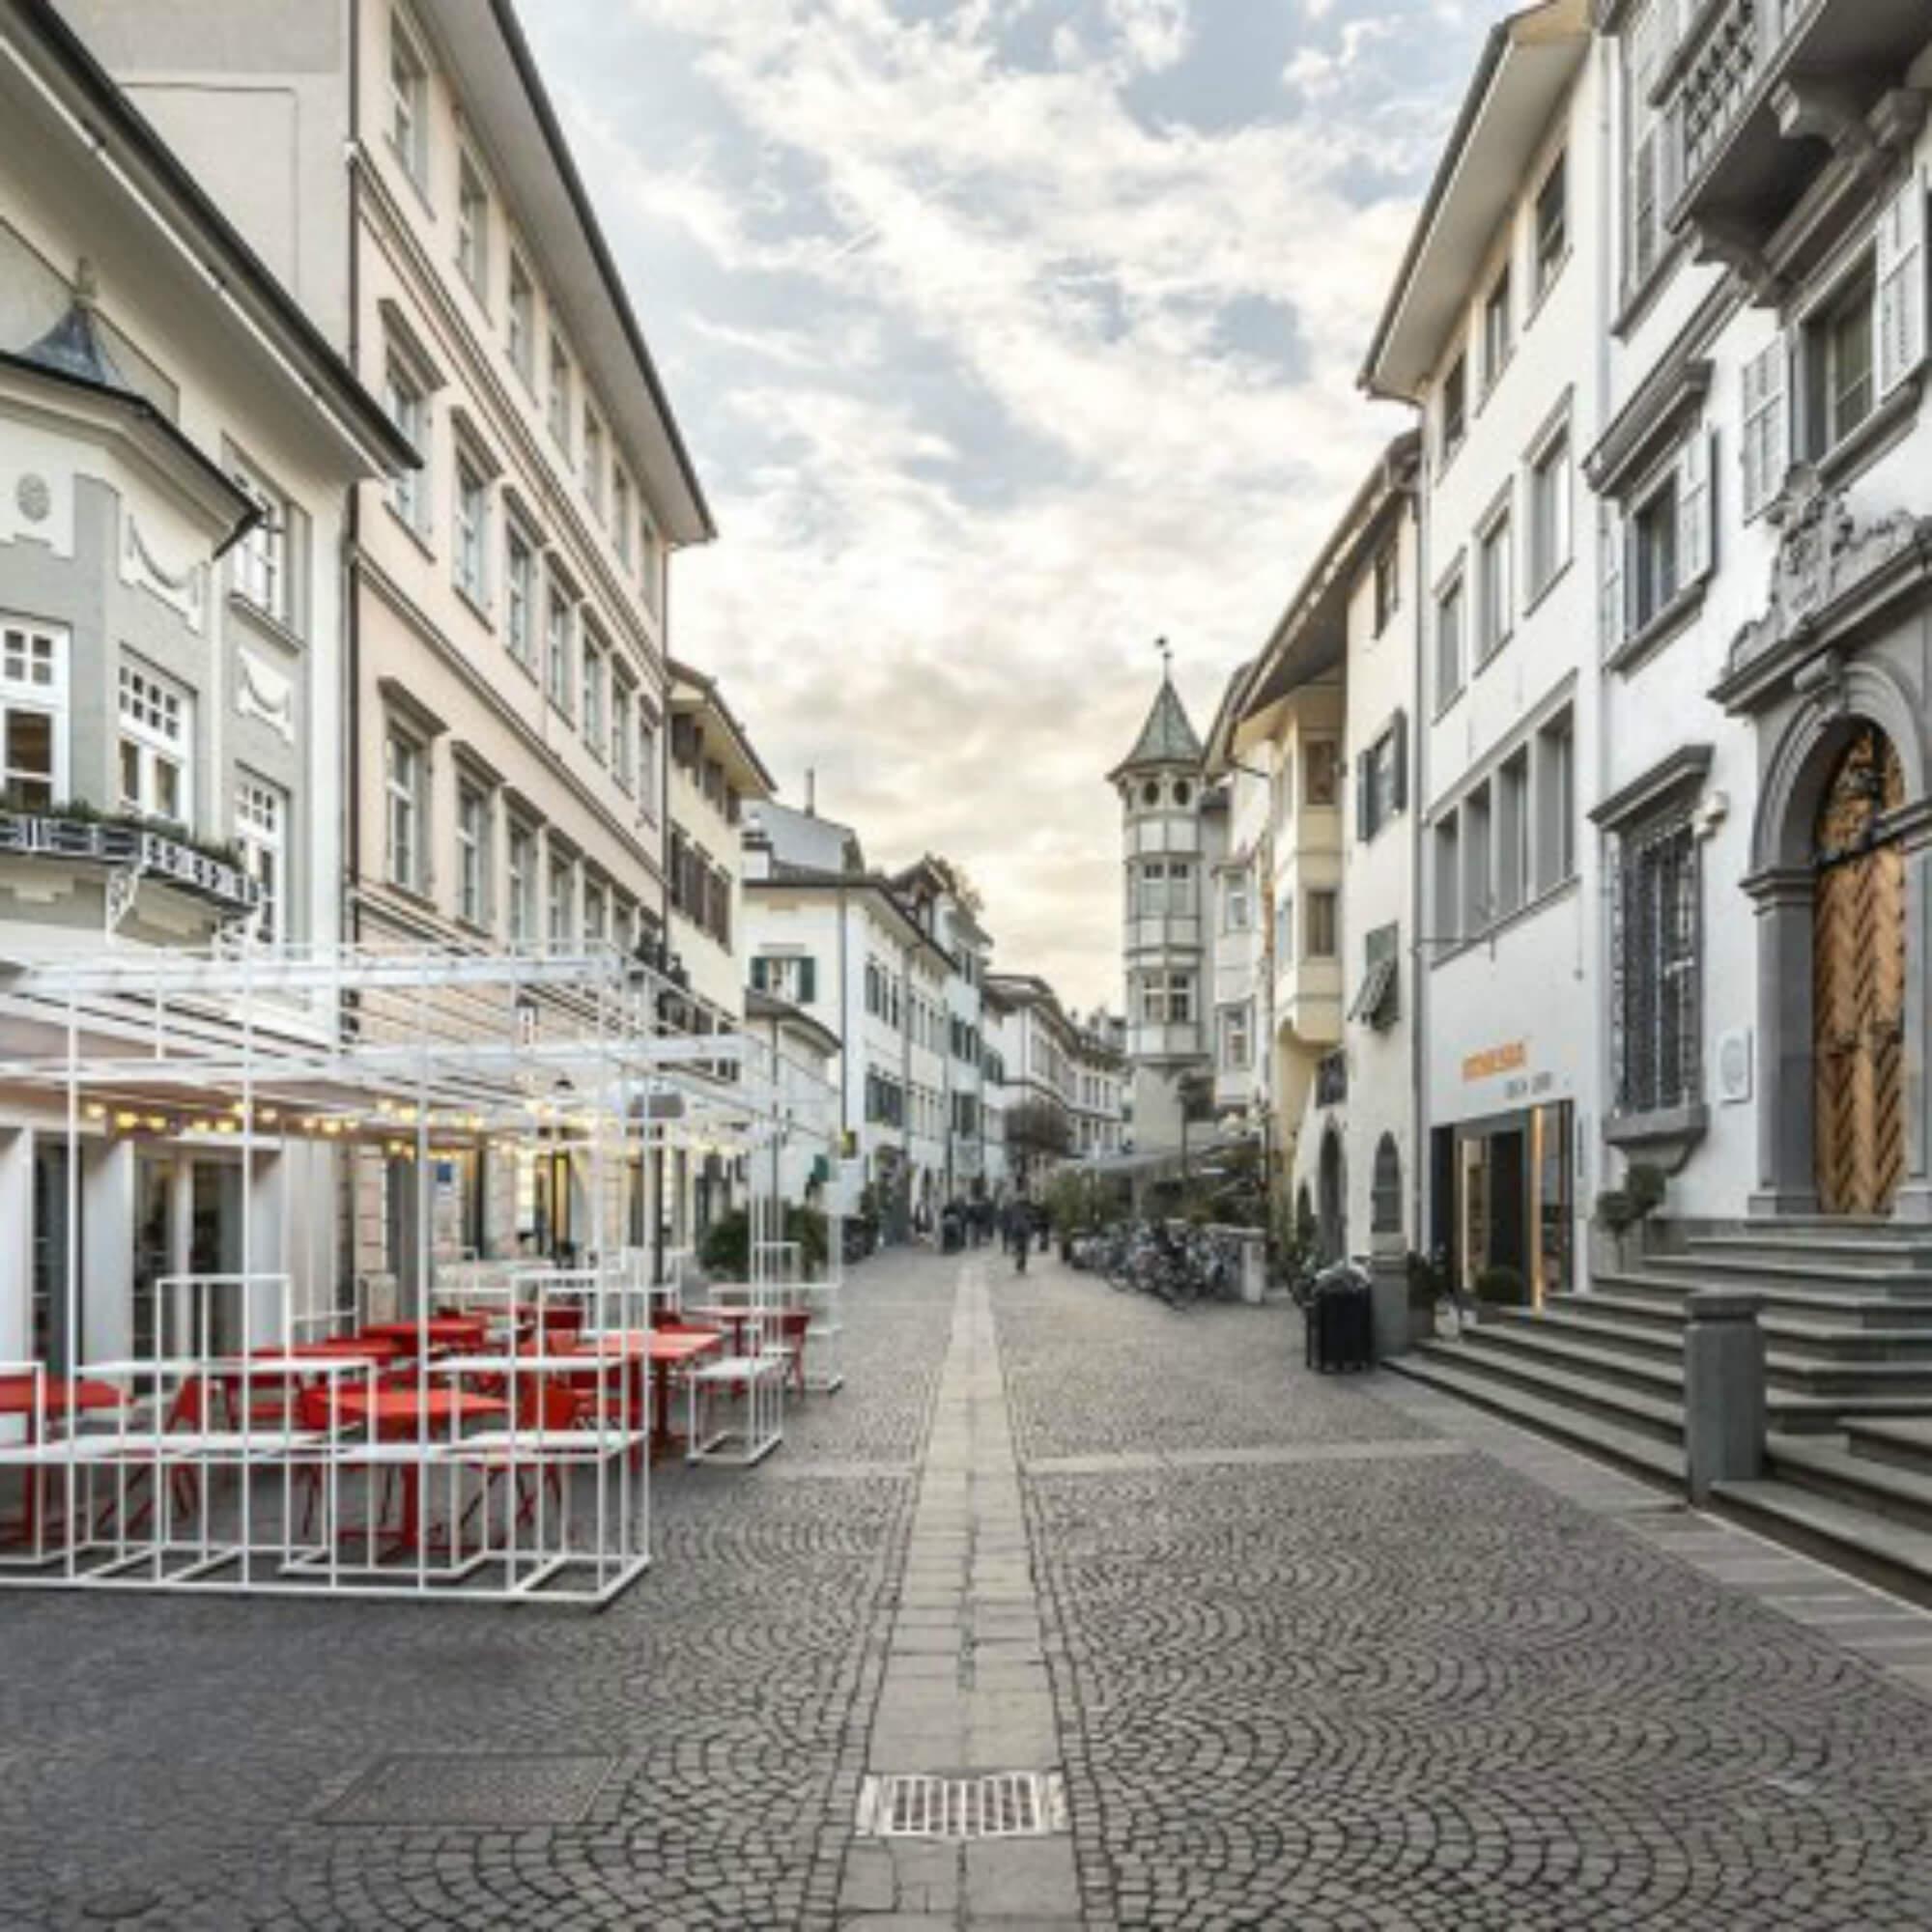 Ü60 Bloggerin Ursel vom IKNMLO Fashionblog über Italia&Amore